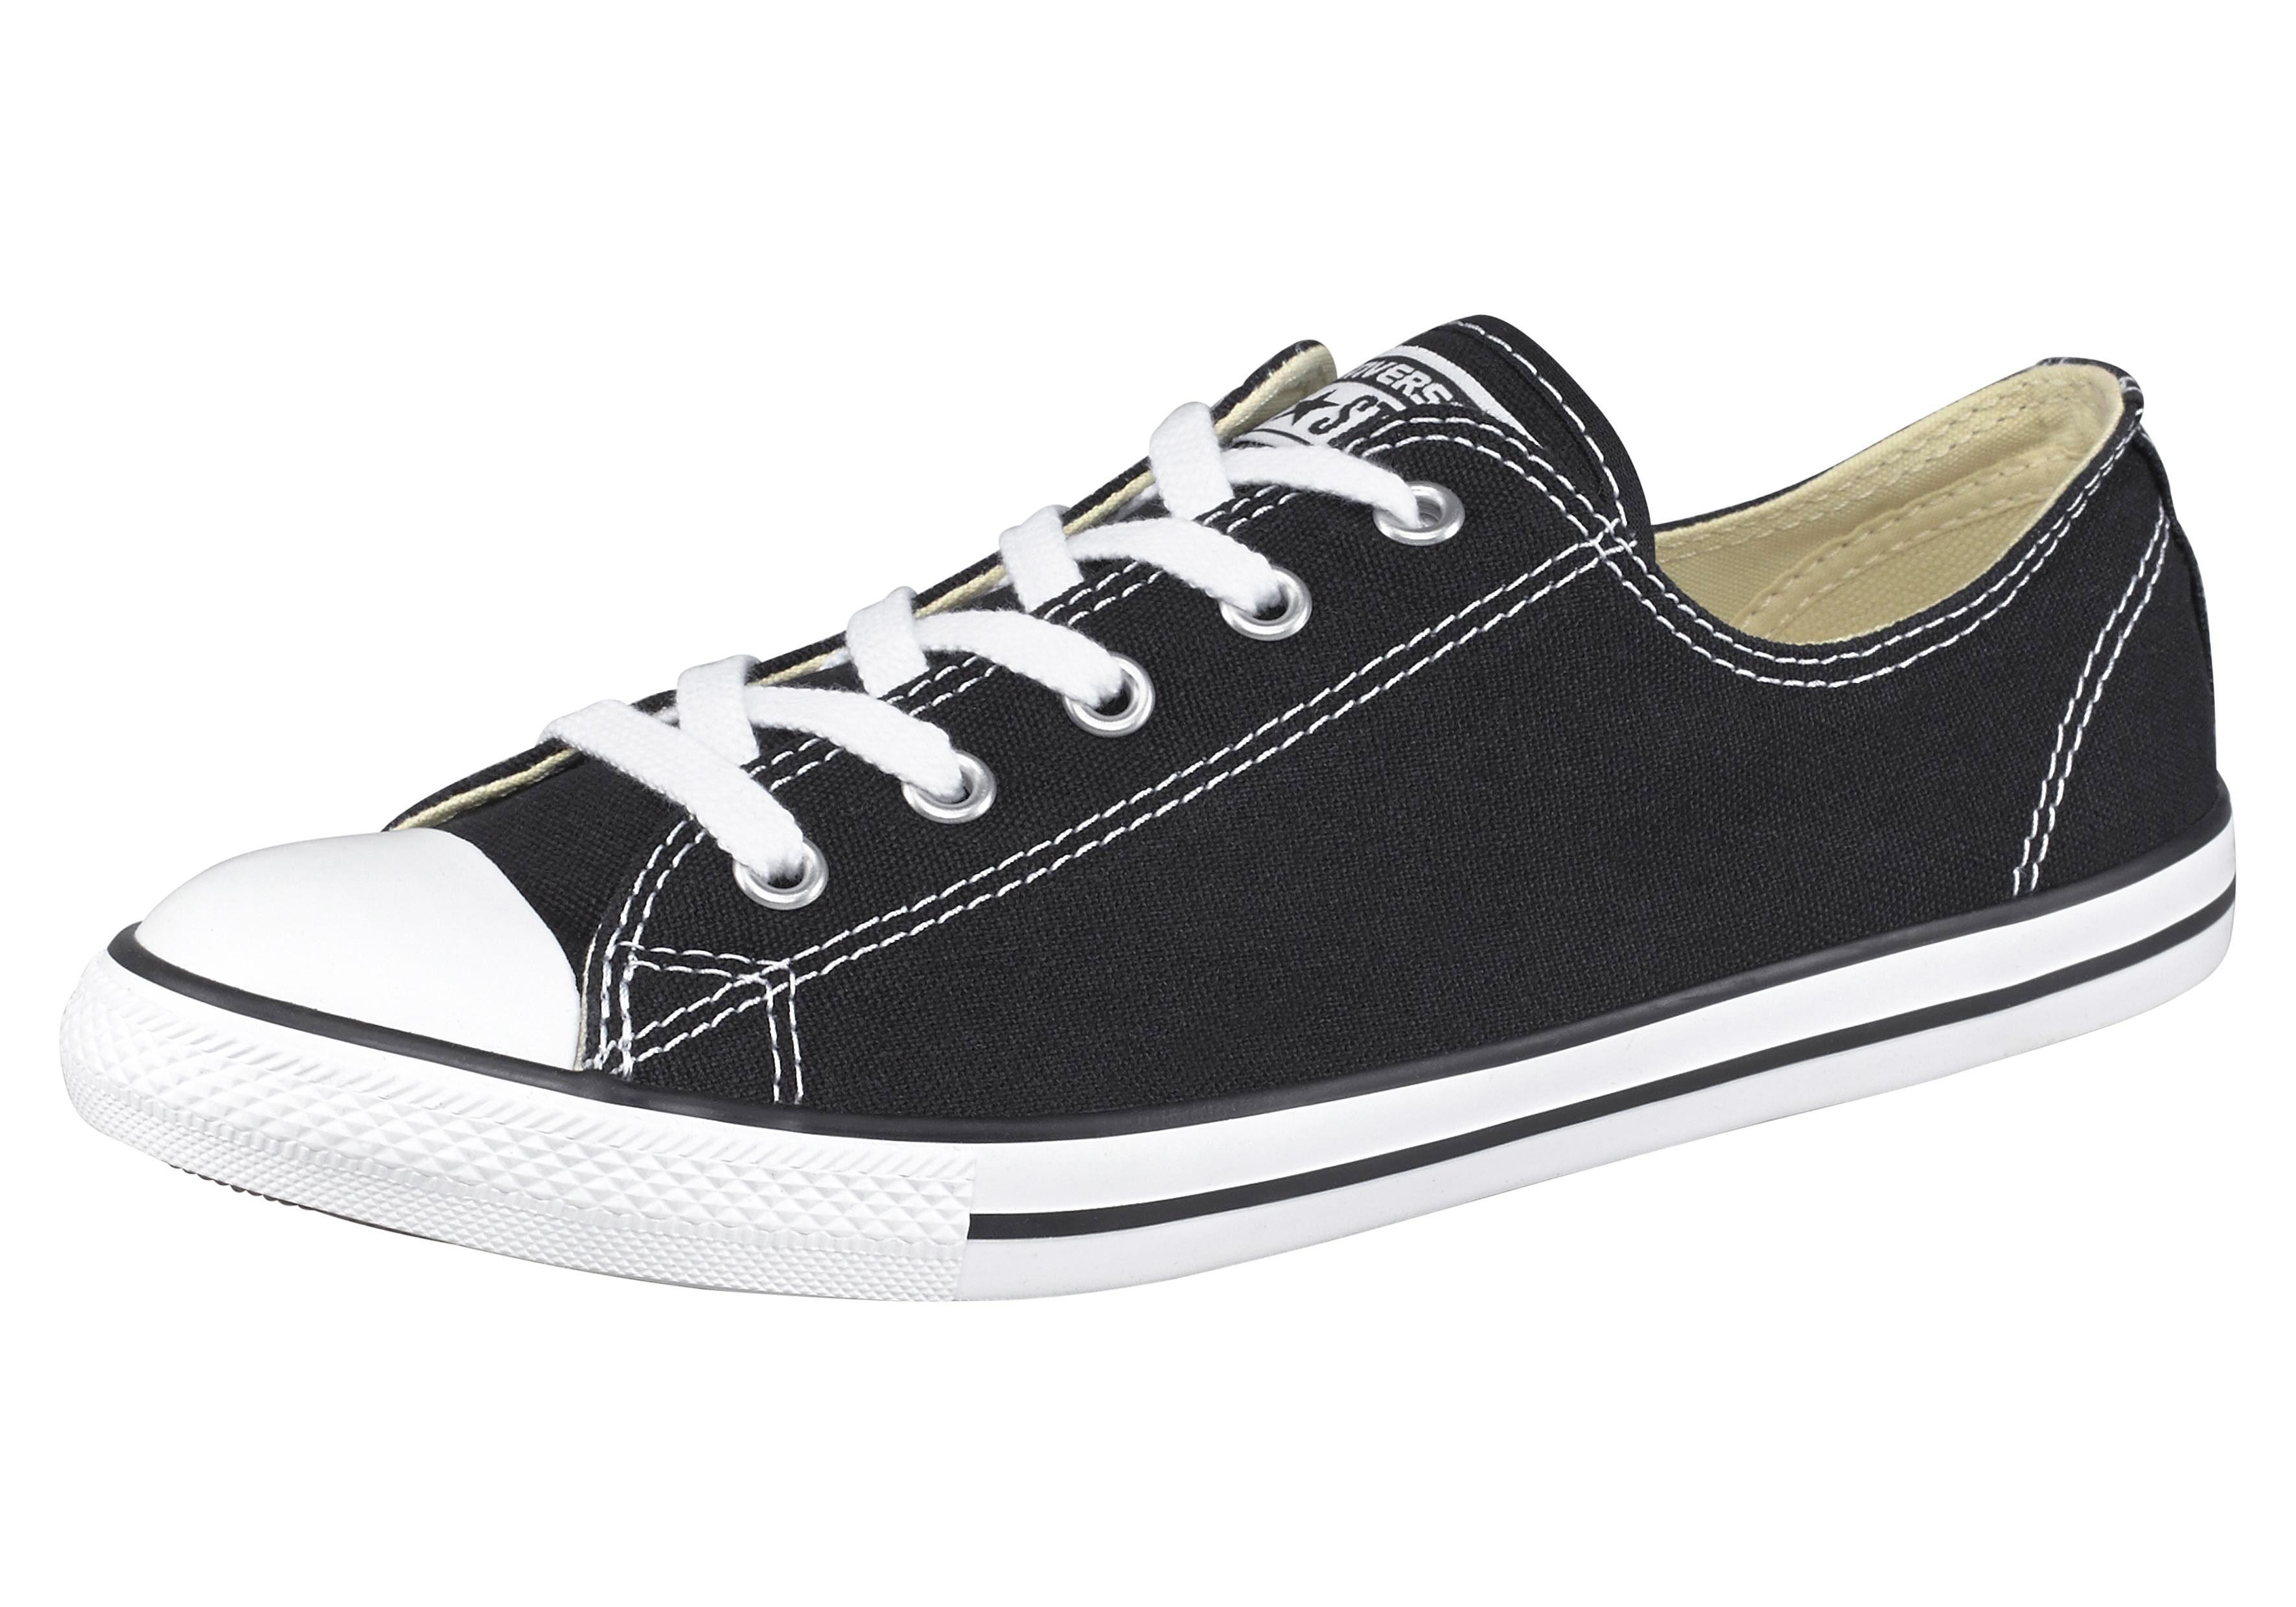 Converse Chuck Taylor All Star Dainty Ox Sneaker  schwarz-weiß